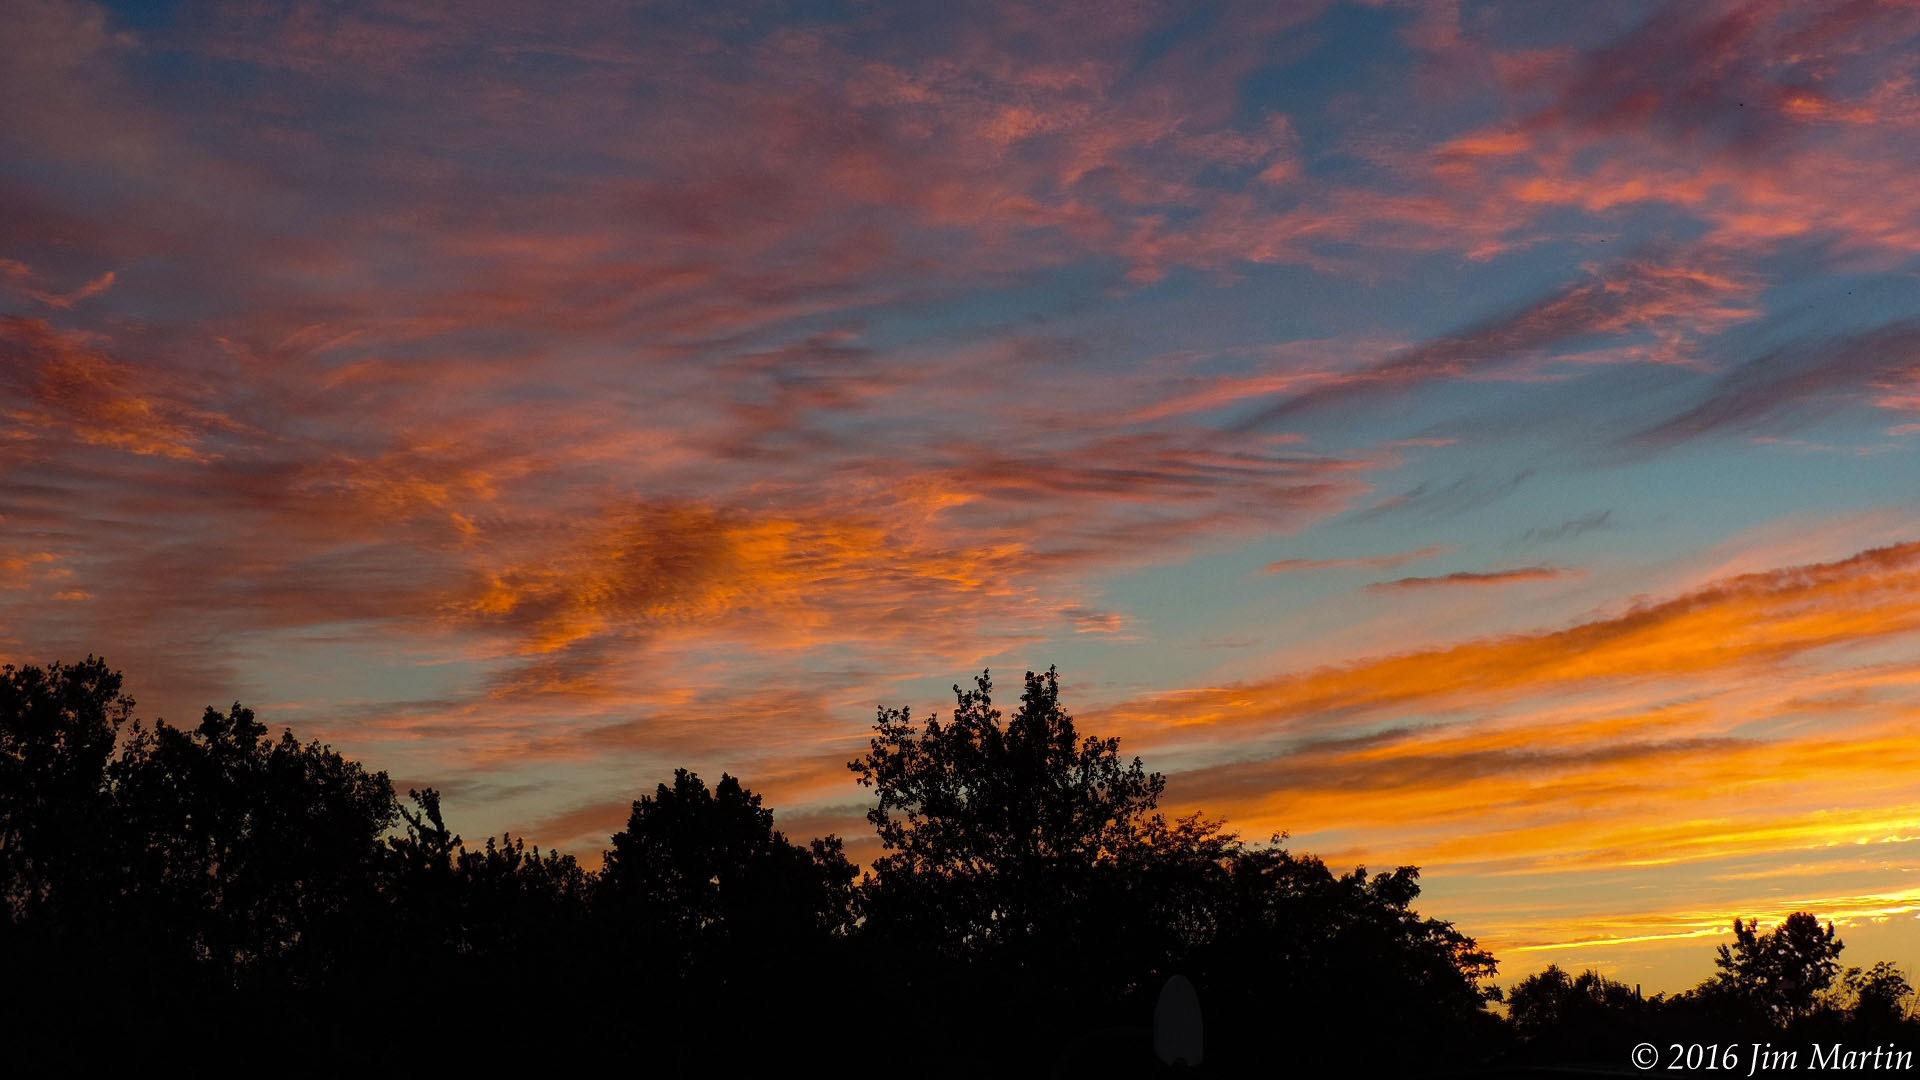 Flashback Sunset by Jim Martin